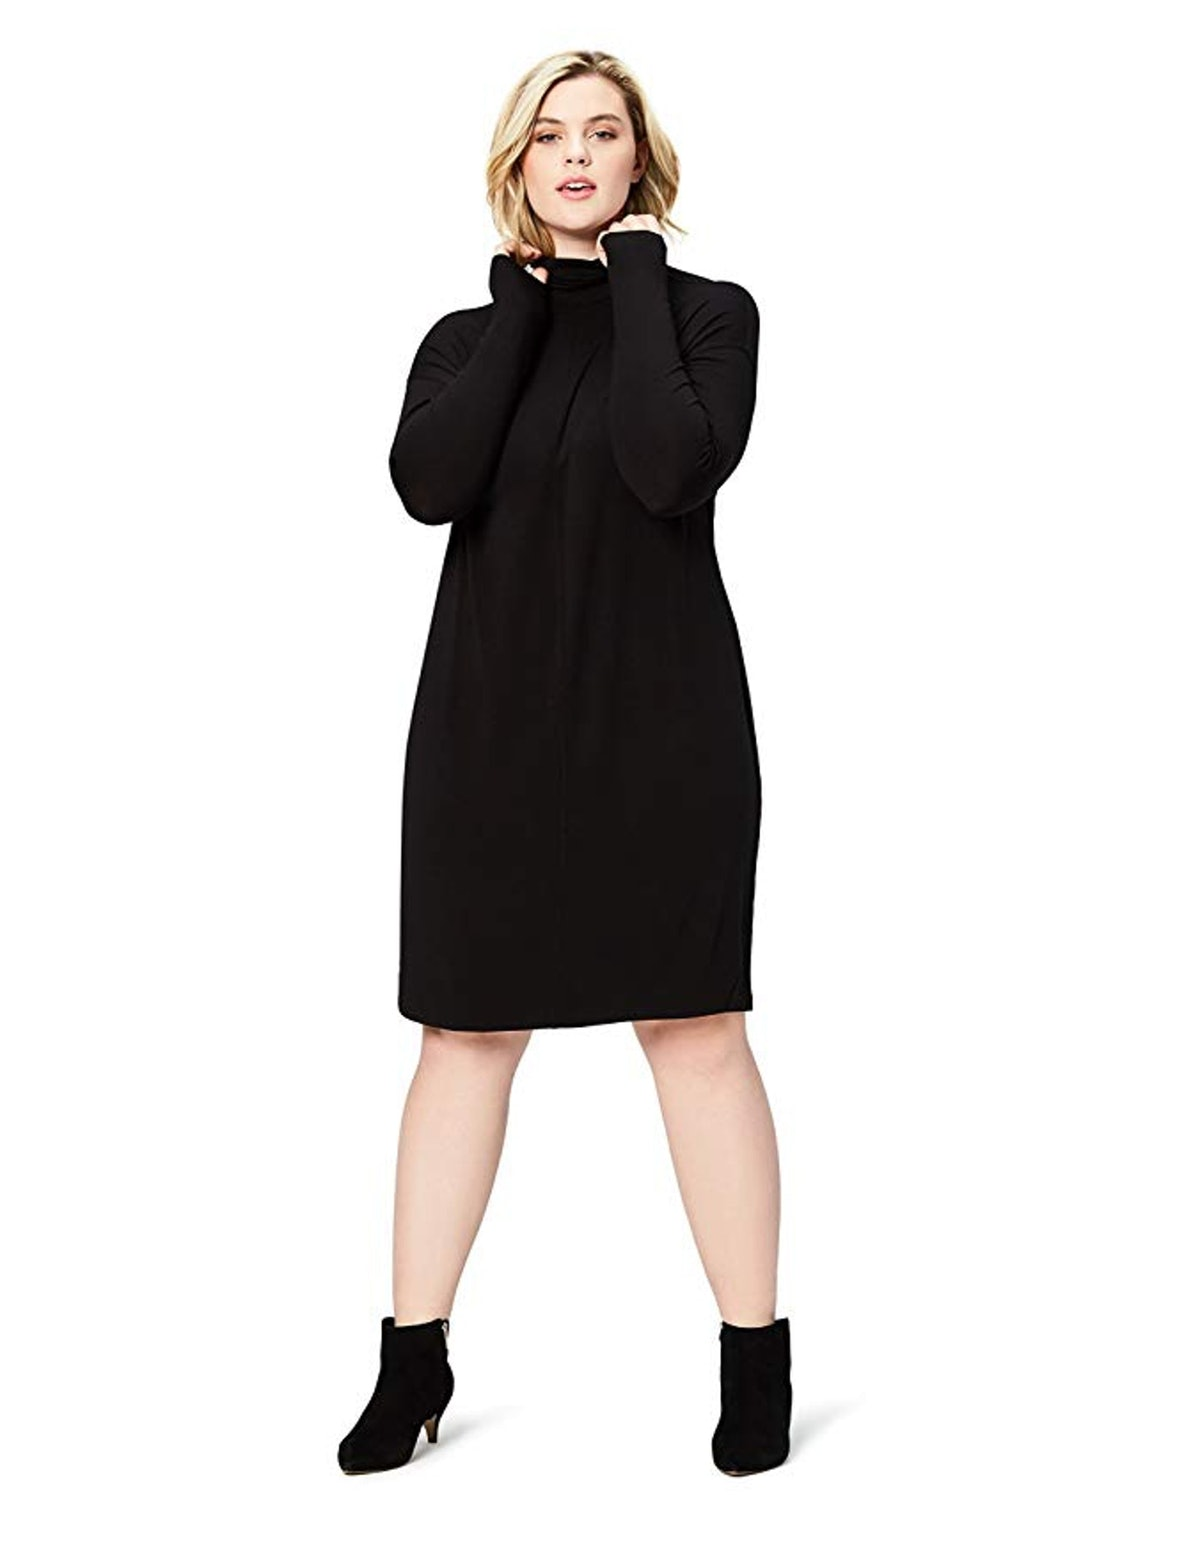 Daily Ritual Women's Plus Size Long-Sleeve Turtleneck Dress